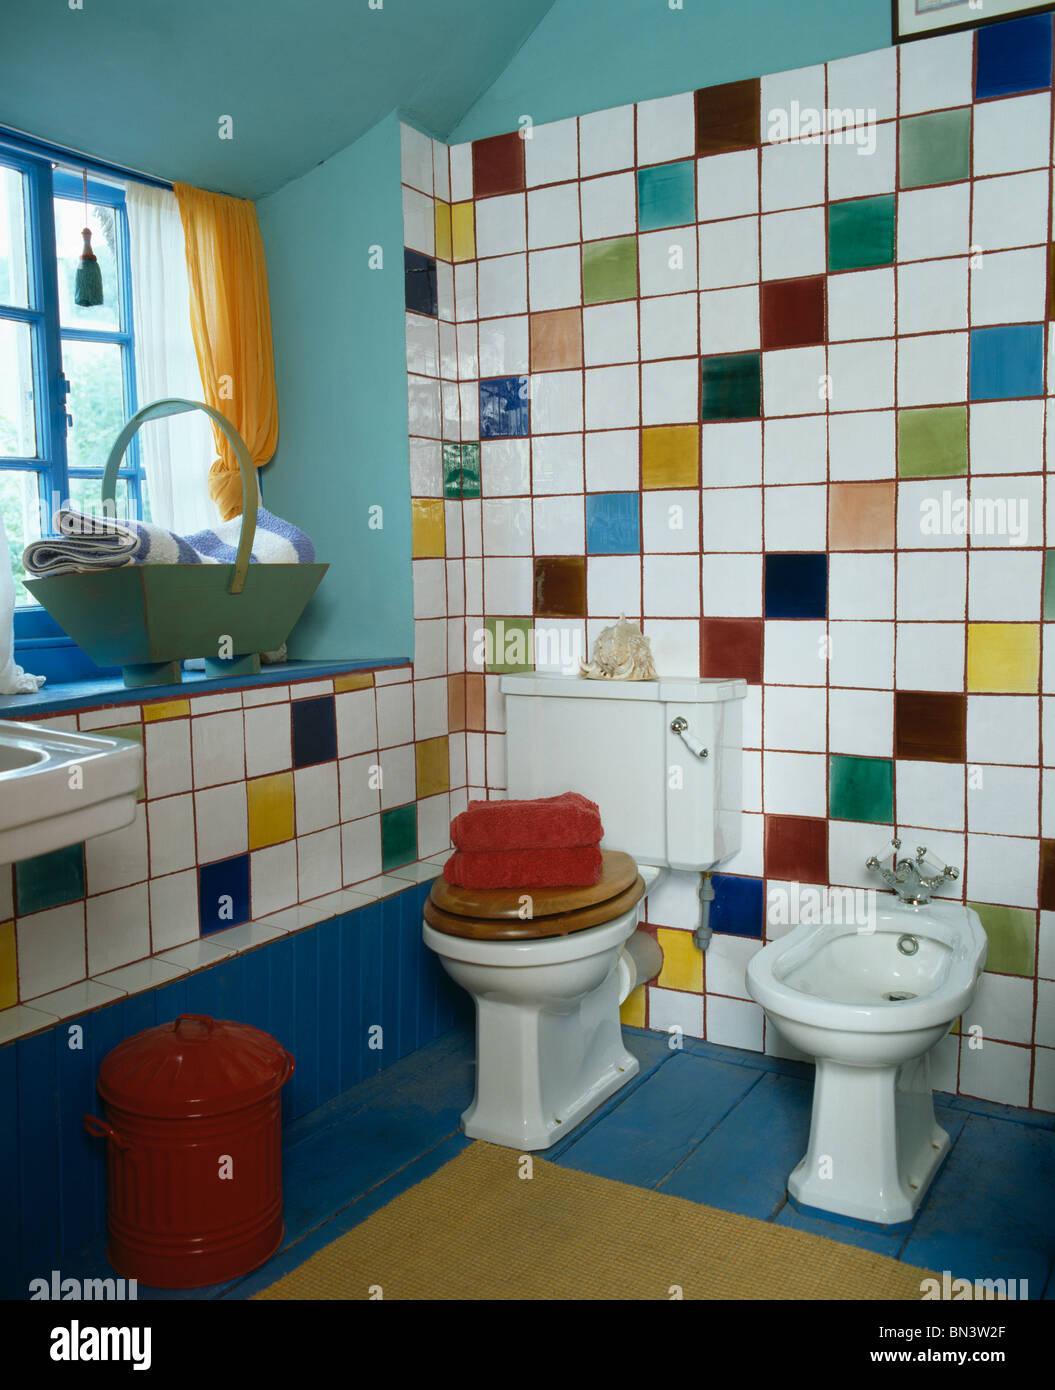 Piastrelle bagno colorate fabulous trasparenze collection with piastrelle bagno blu mare with - Piastrelle bagno decorate ...